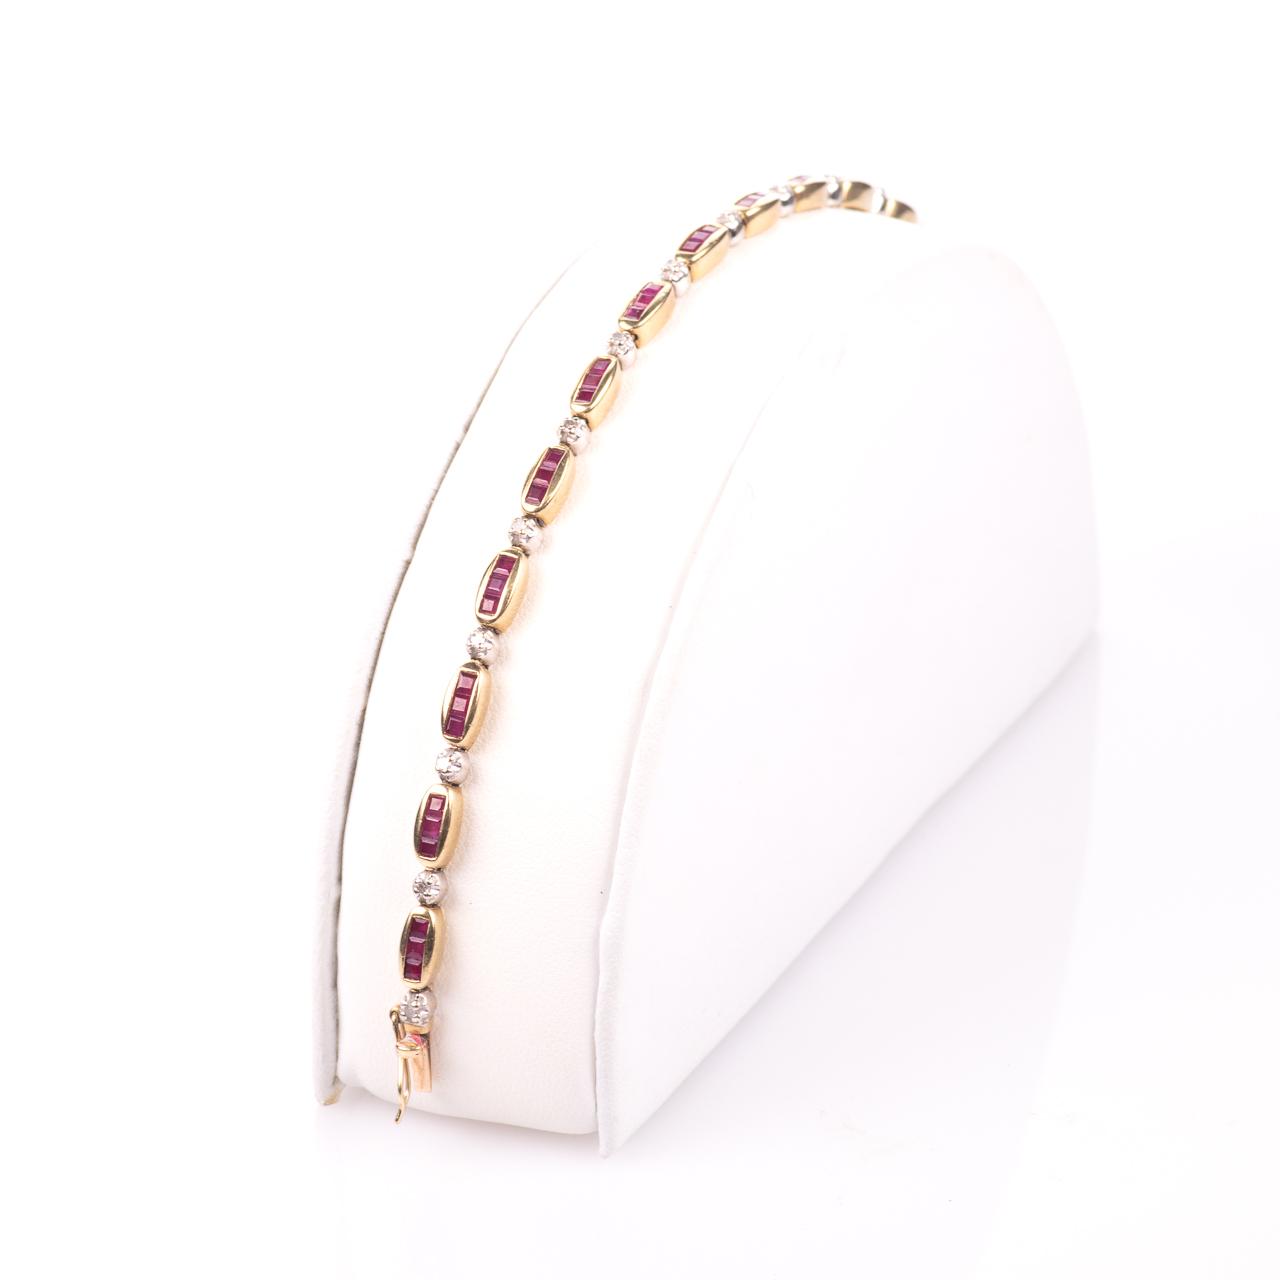 9ct Gold 2ct Ruby & Diamond Tennis Bracelet - Image 3 of 6